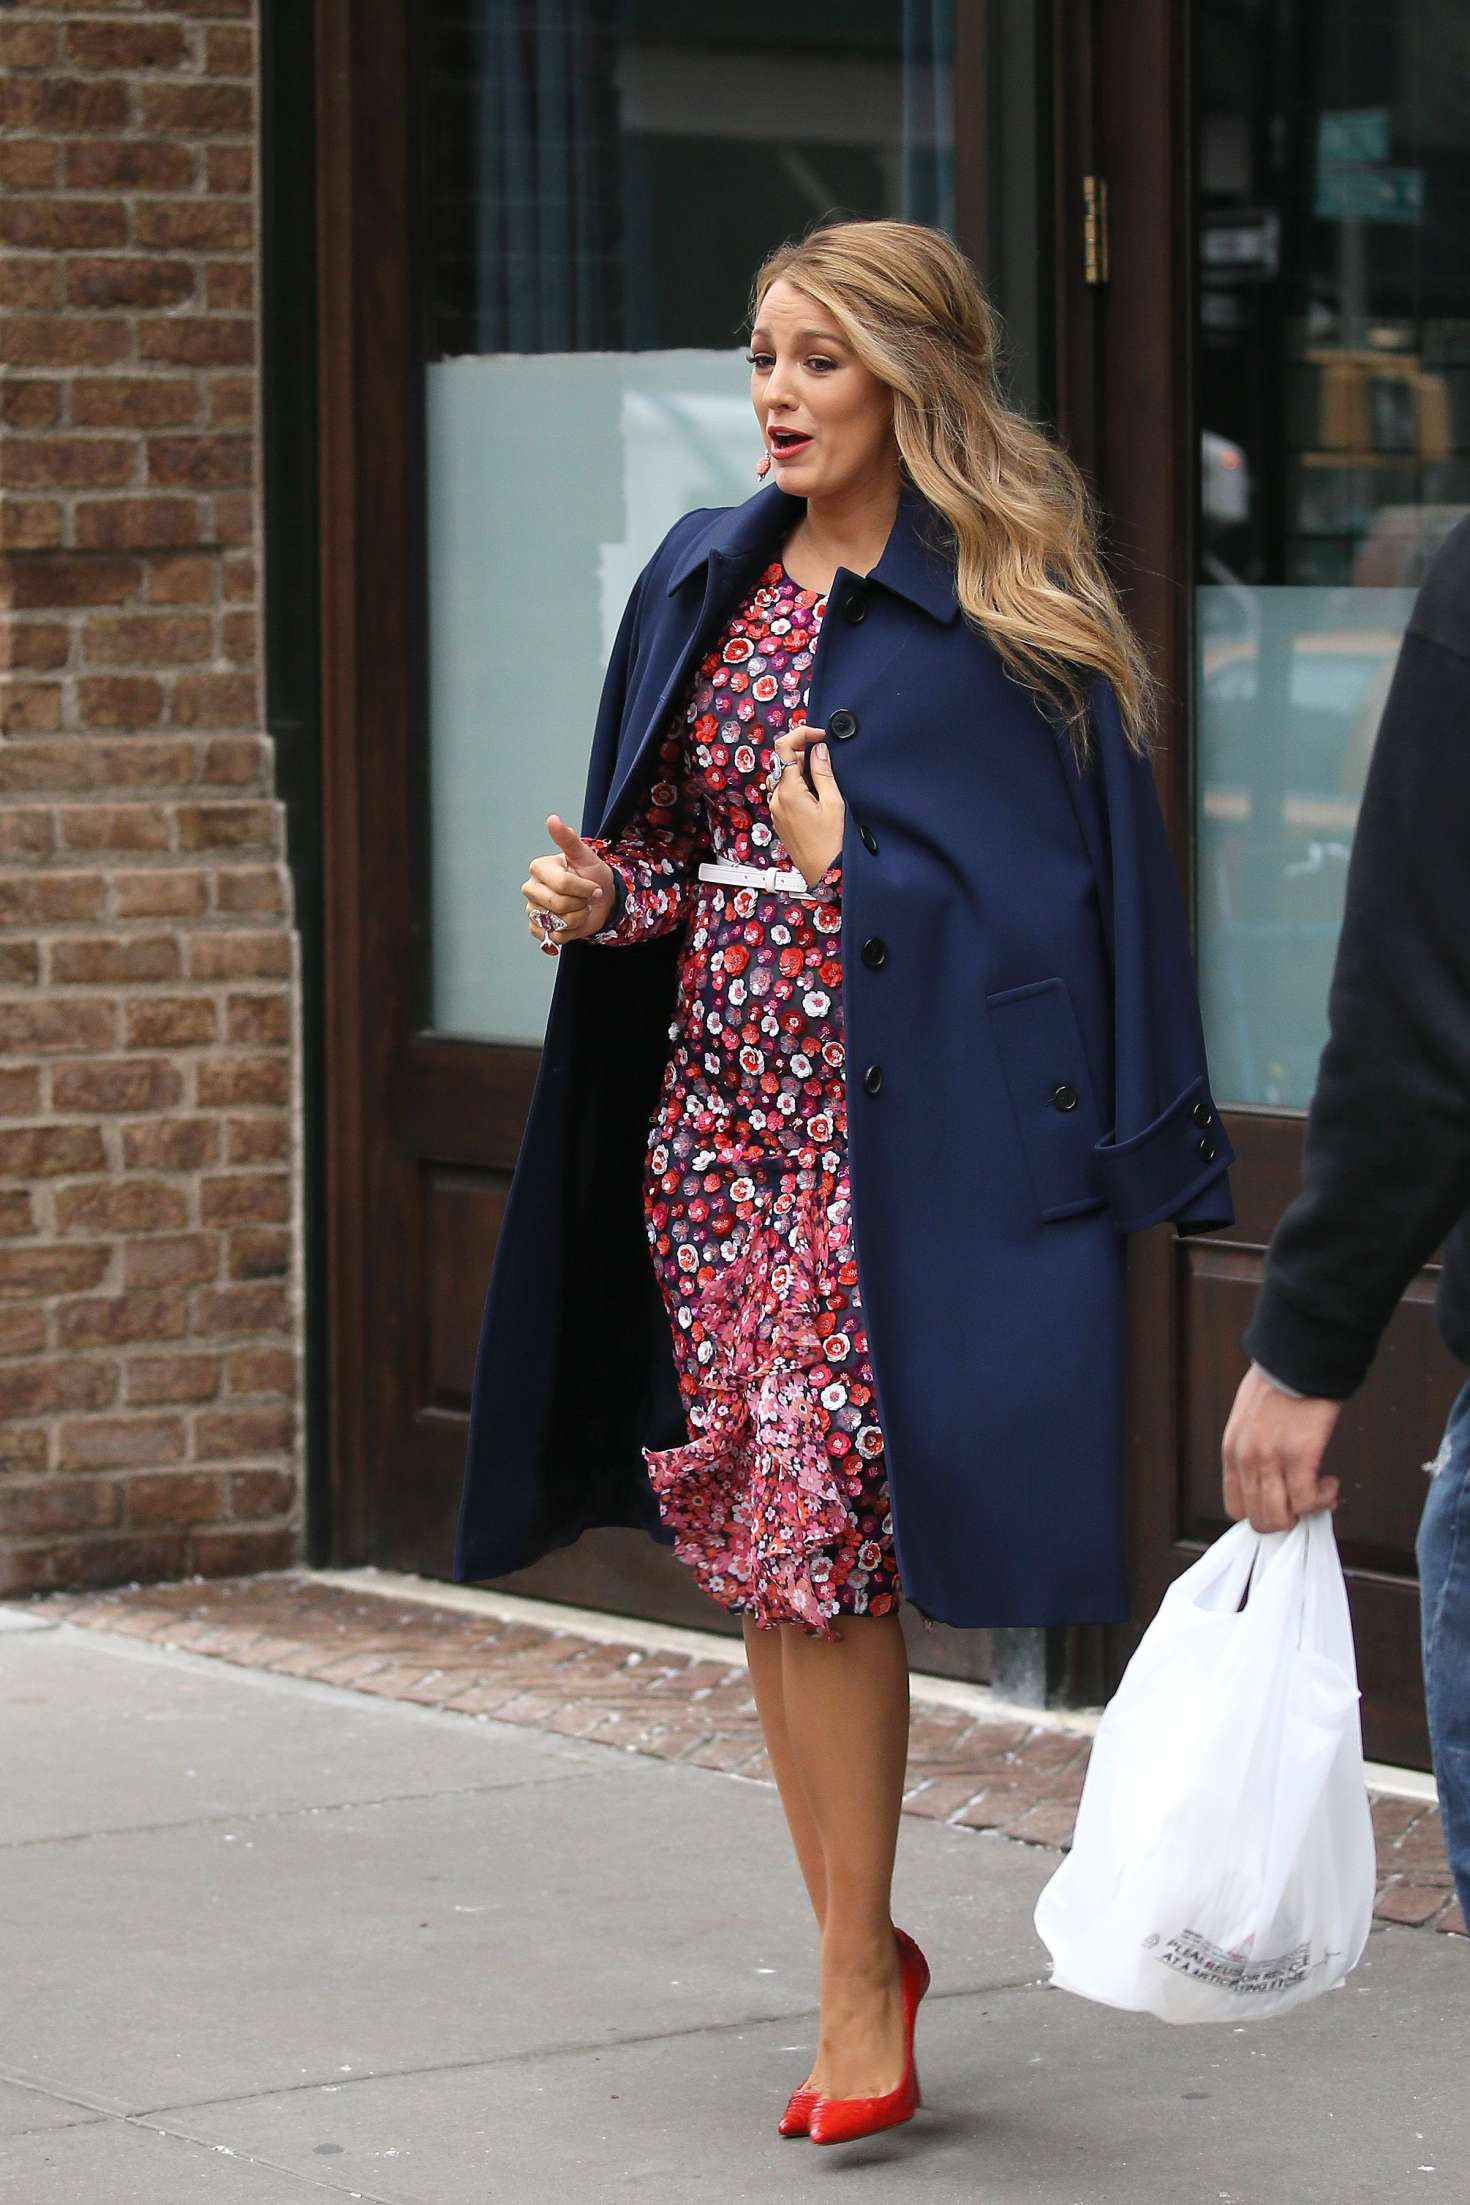 Blake Lively 2017 : Blake Lively: Leaving her hotel in New York City -09